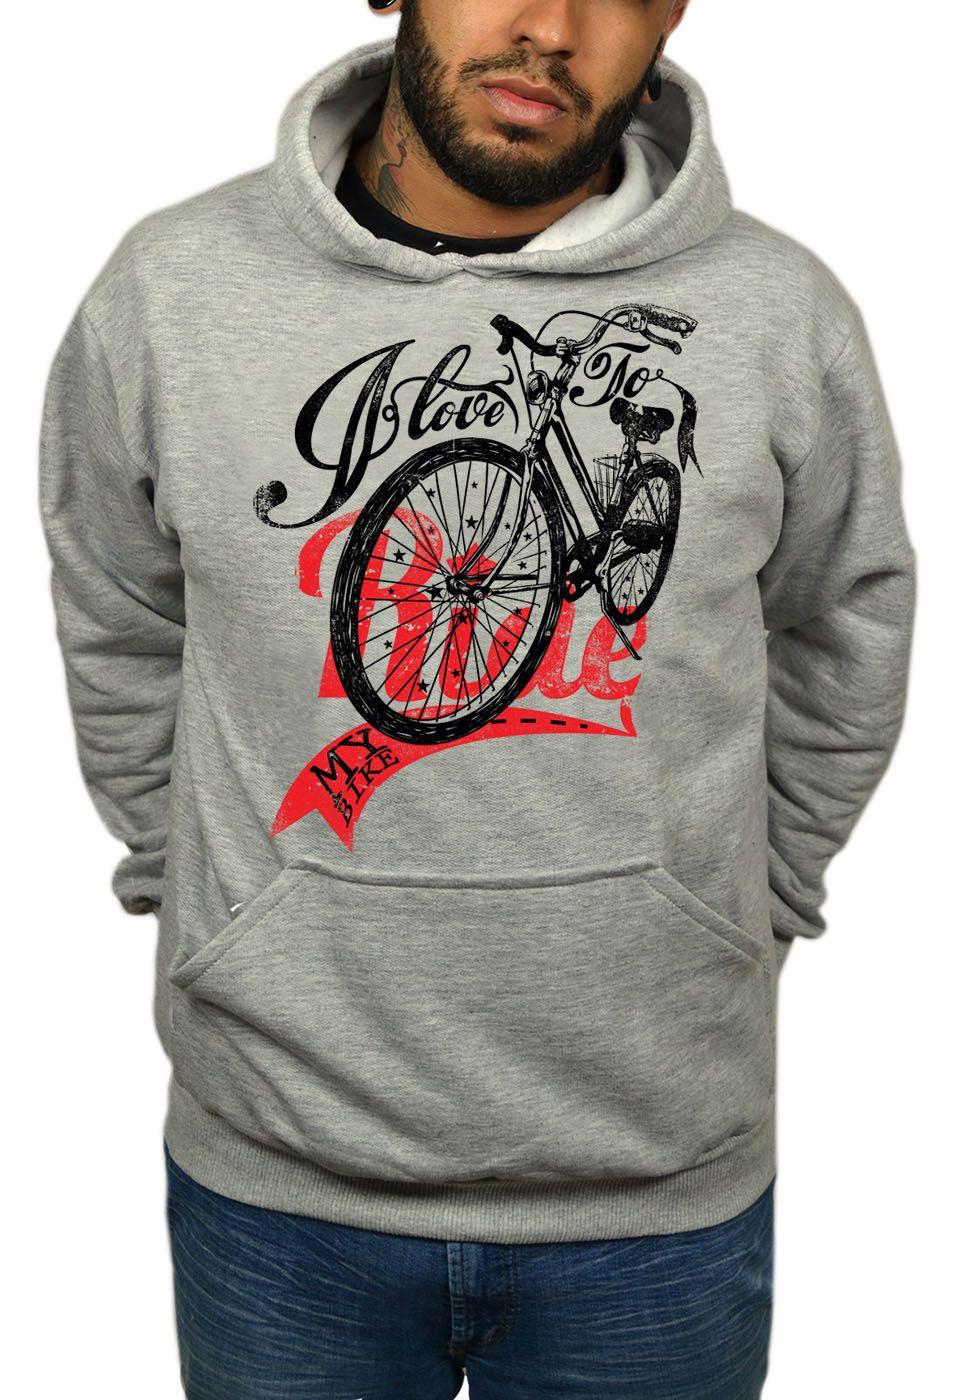 Moletom HShop Love My Bike  - HShop